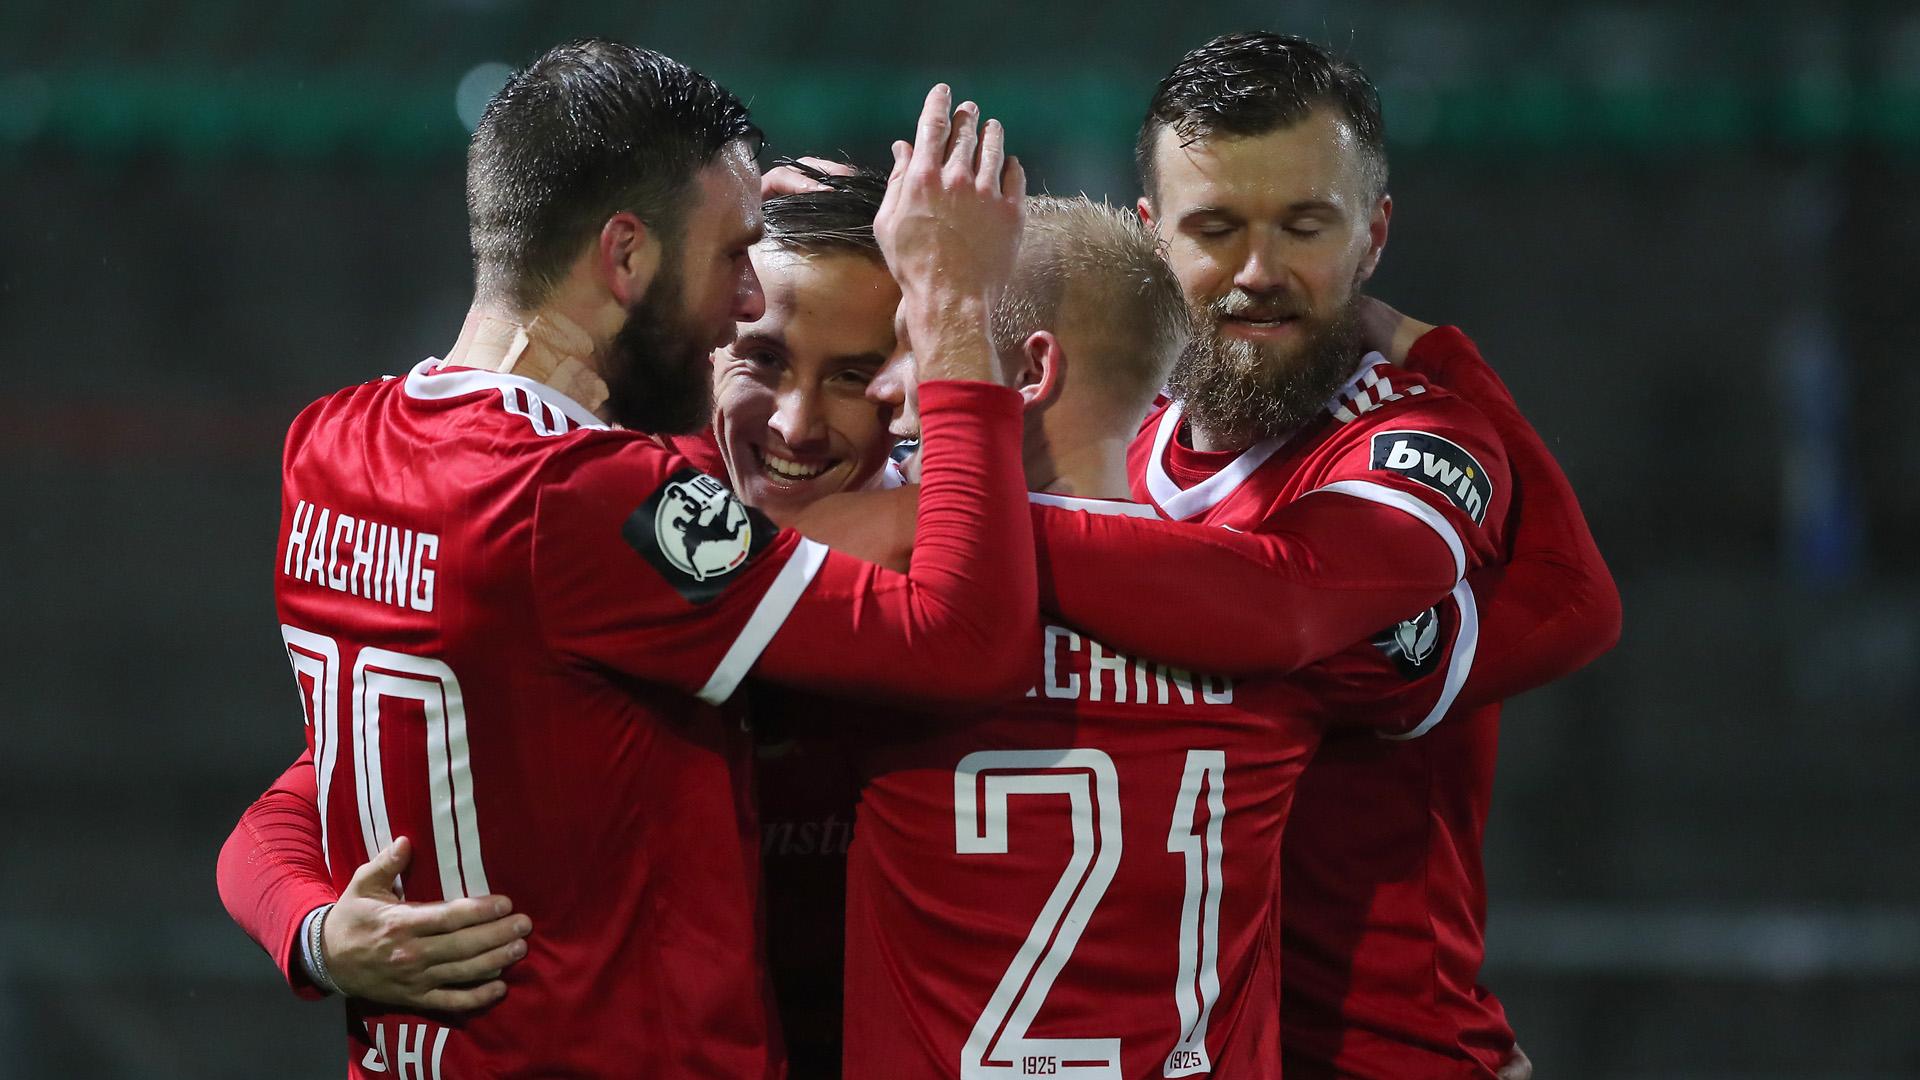 3 Liga 1 Fc Kaiserslautern Vs Unterhaching Heute Live Im